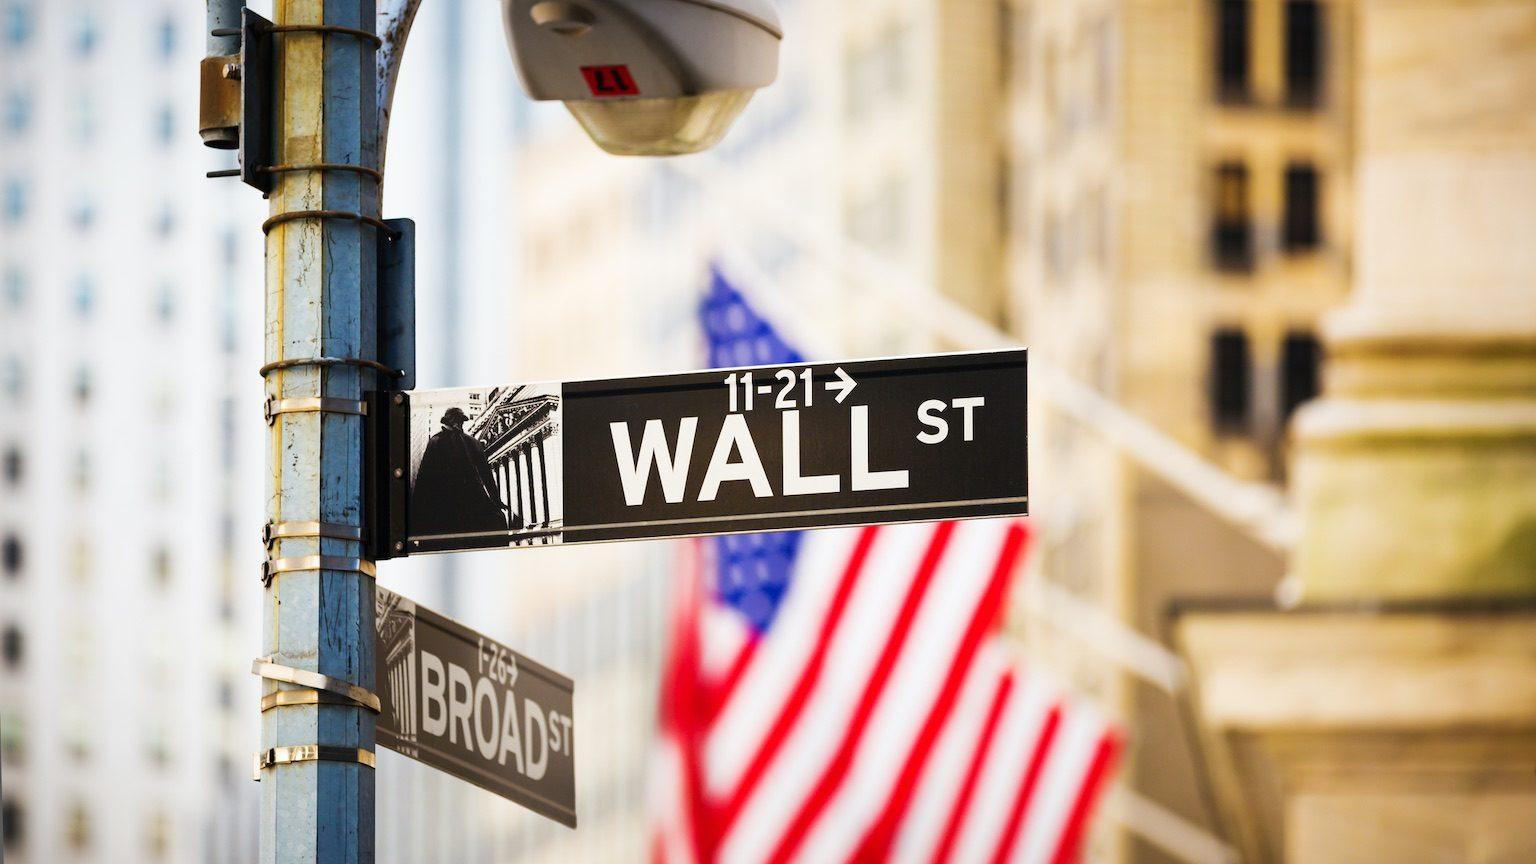 Wall Street sign, New York City, USA.